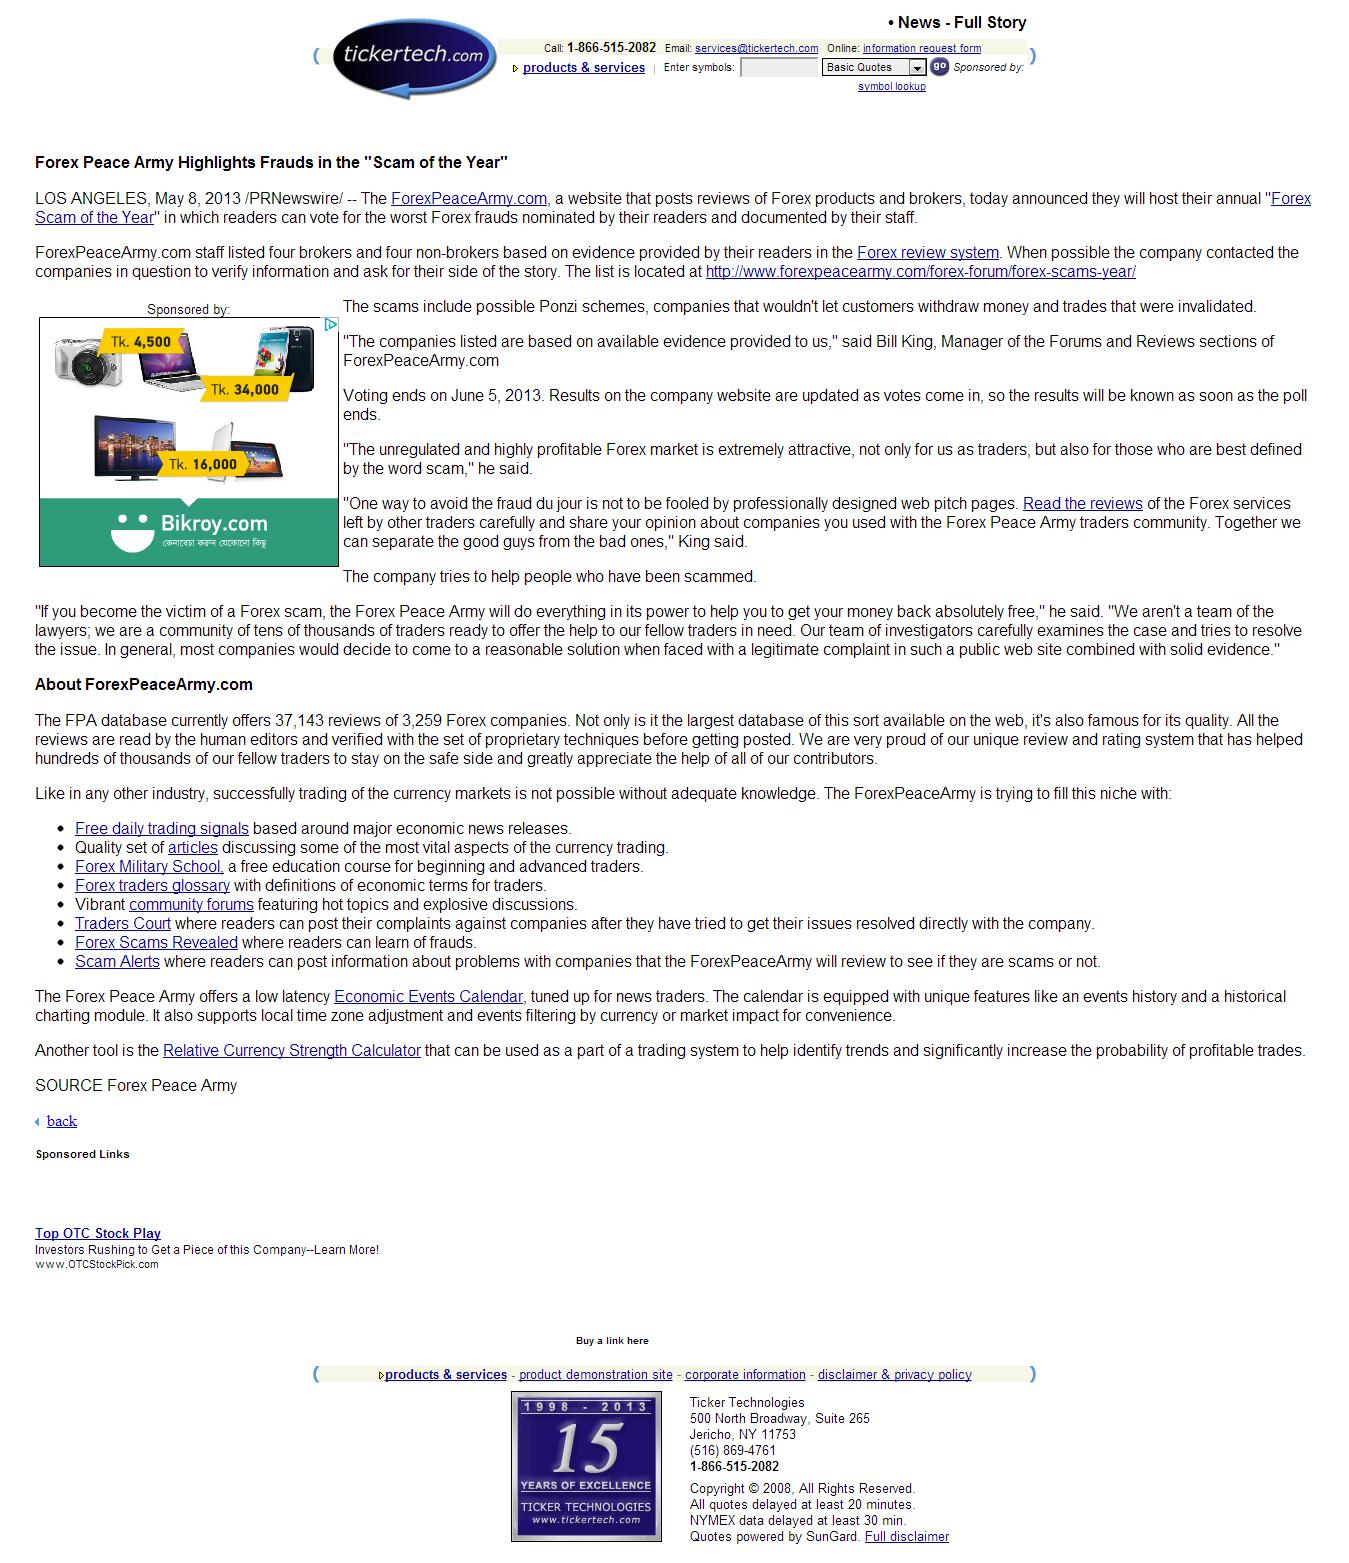 Forex Peace Army | Ticker Technologies